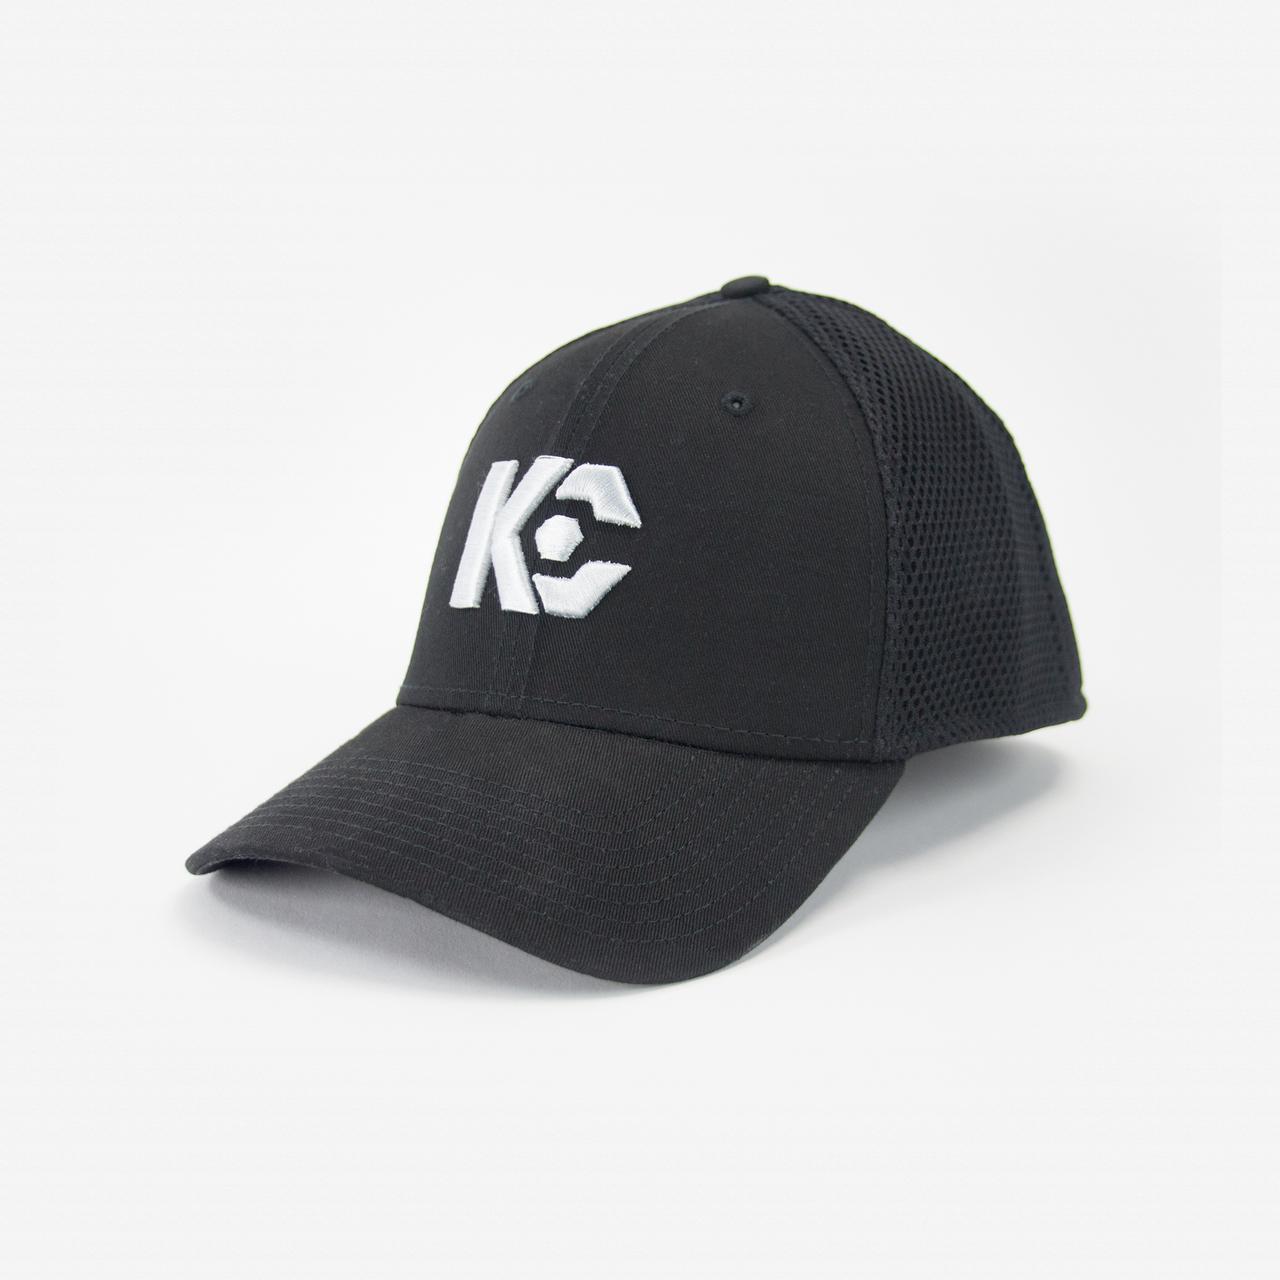 KC Tool New Era 39THIRTY Hat w/ Mesh Back - KC Tool